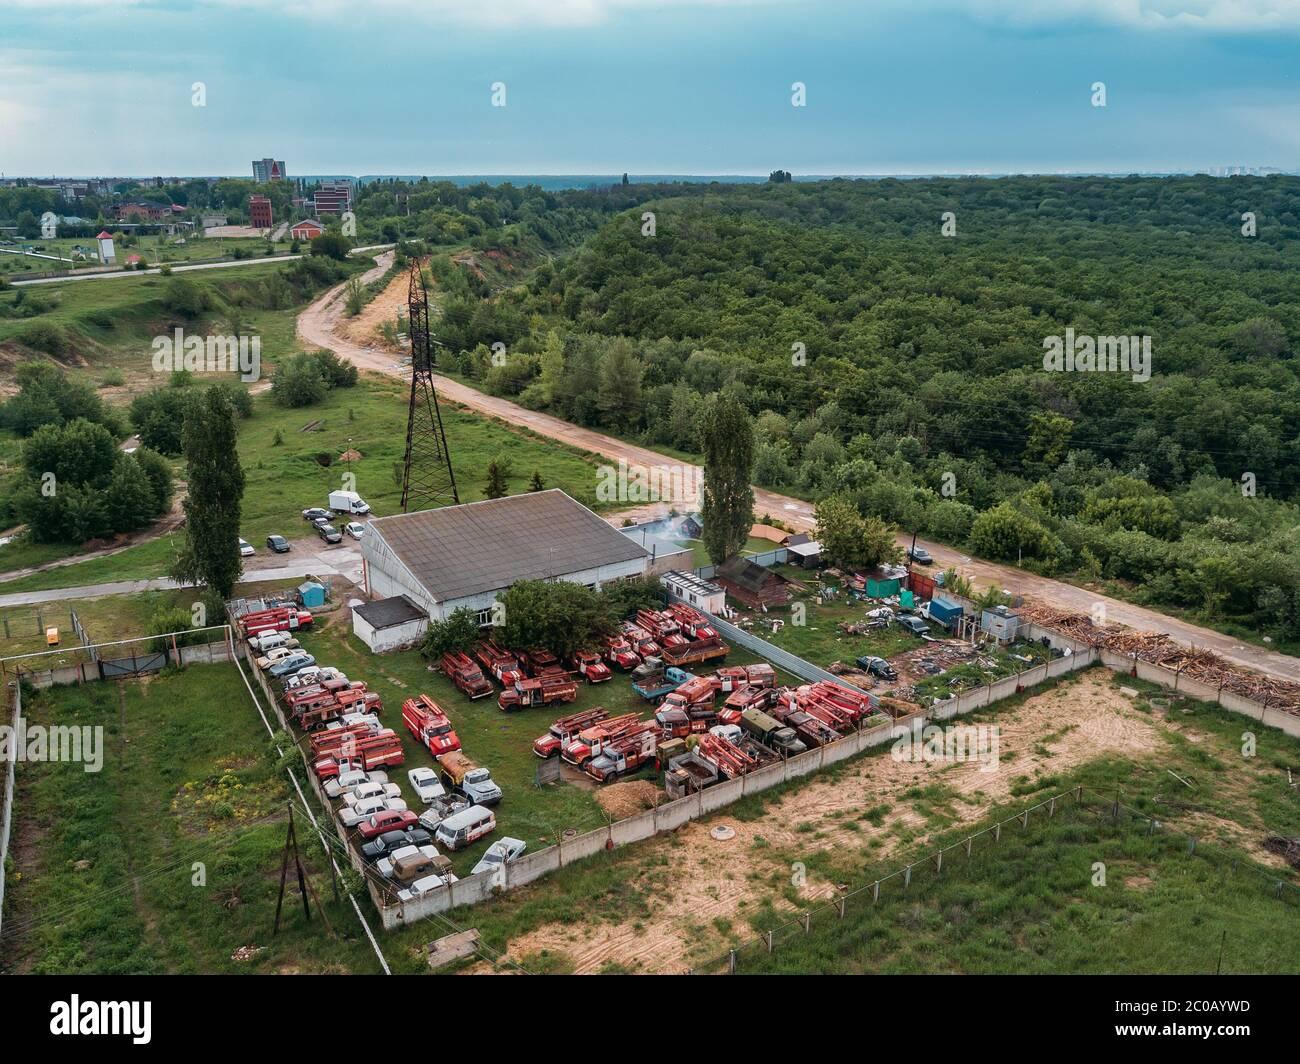 Old rusty broken Russian fire trucks for scrap metal, aerial view. Stock Photo